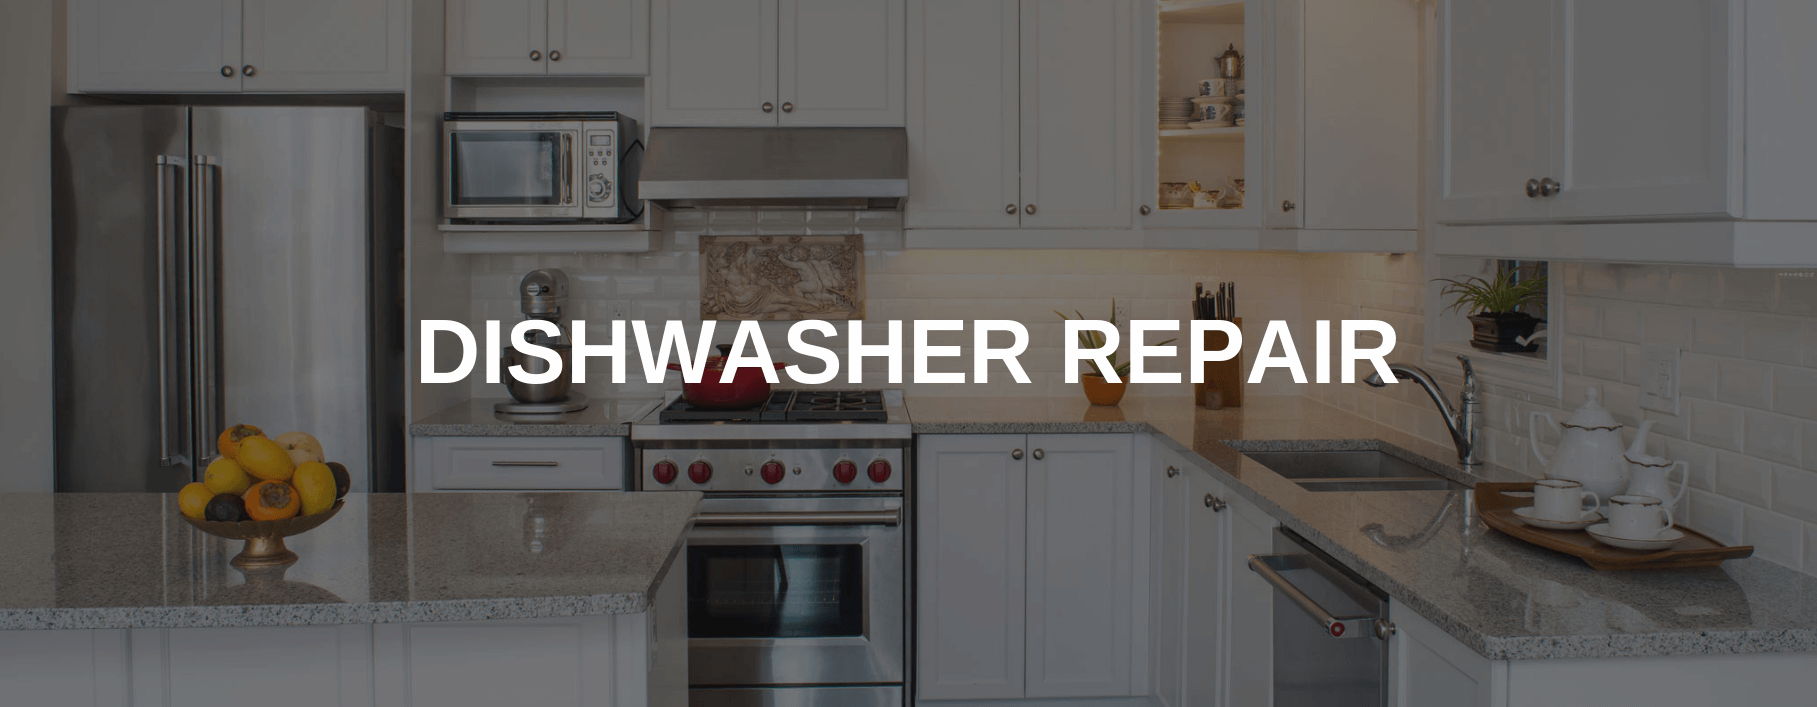 dishwasher repair augusta